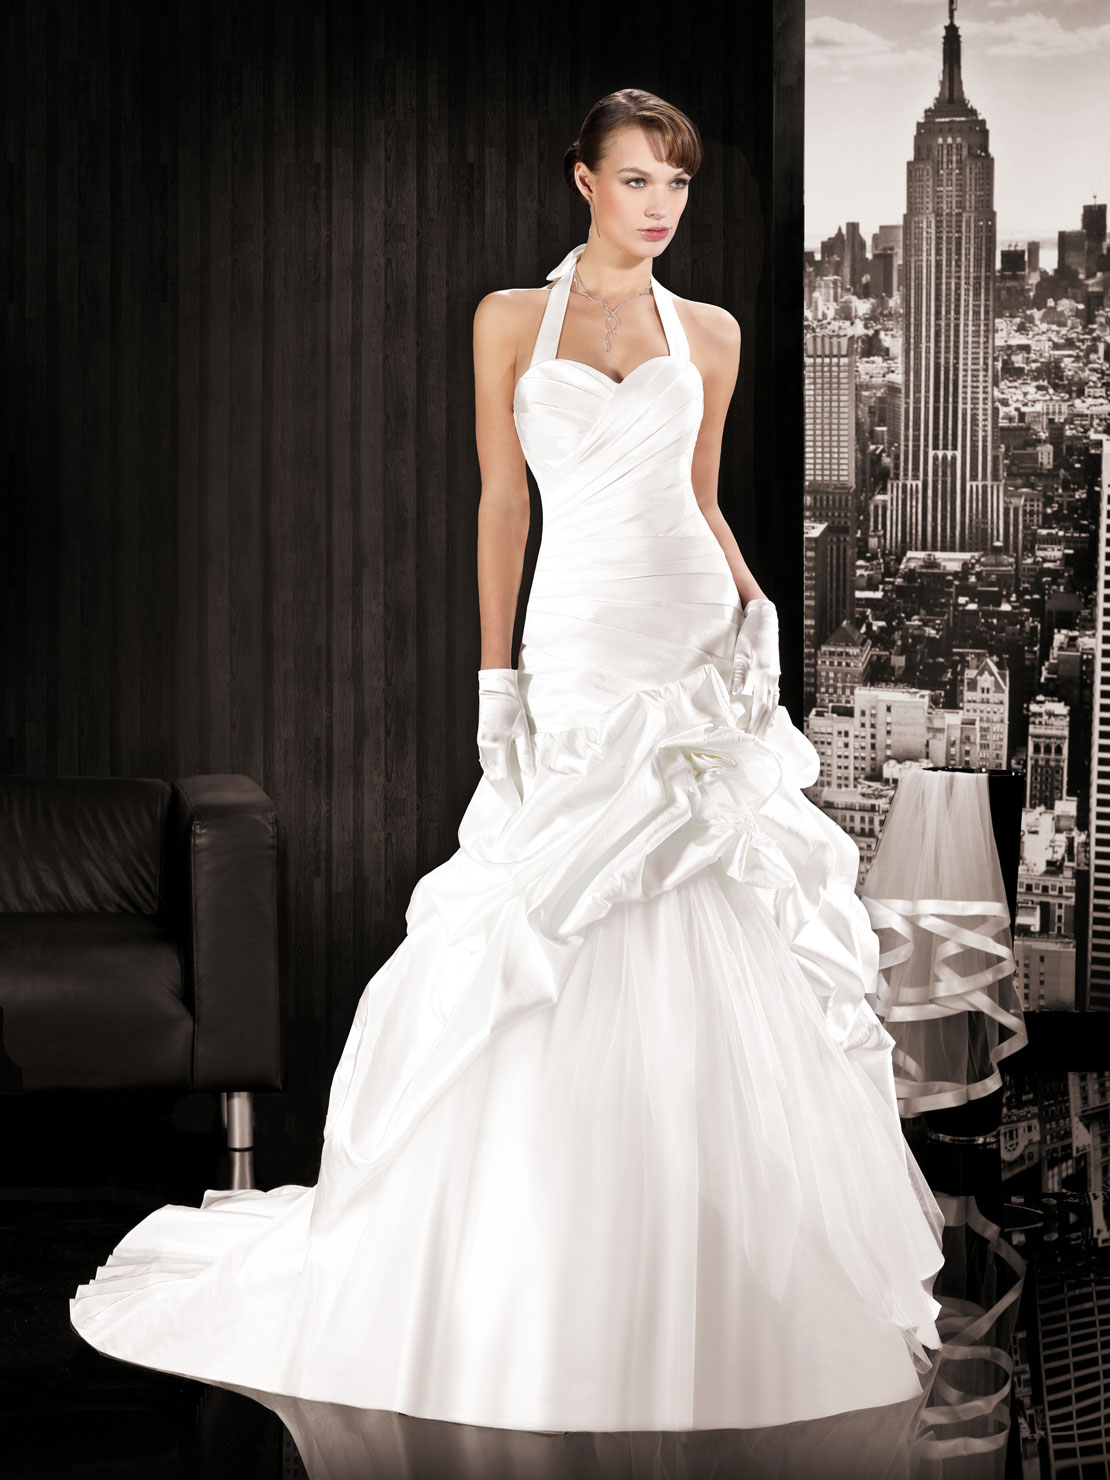 Miss paris 2014 wedding dress 1 the fashionbrides for Wedding dress in paris